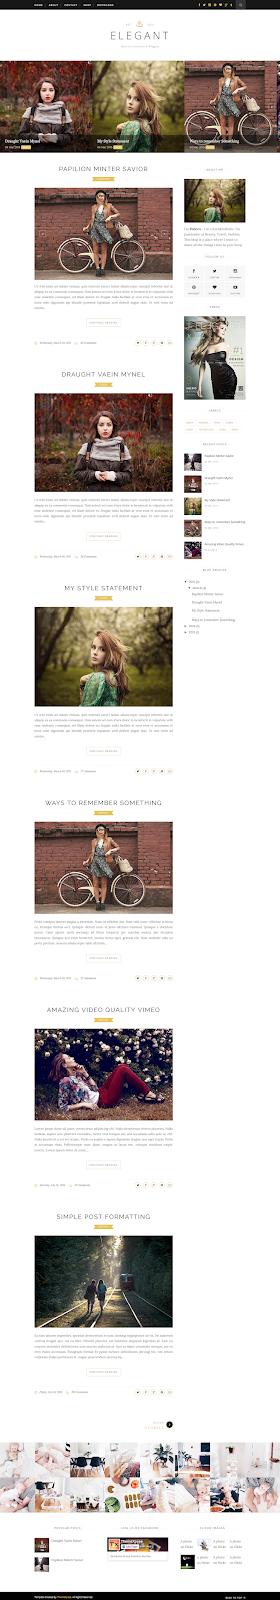 Elegant - Clean & Responsive Blogger Template